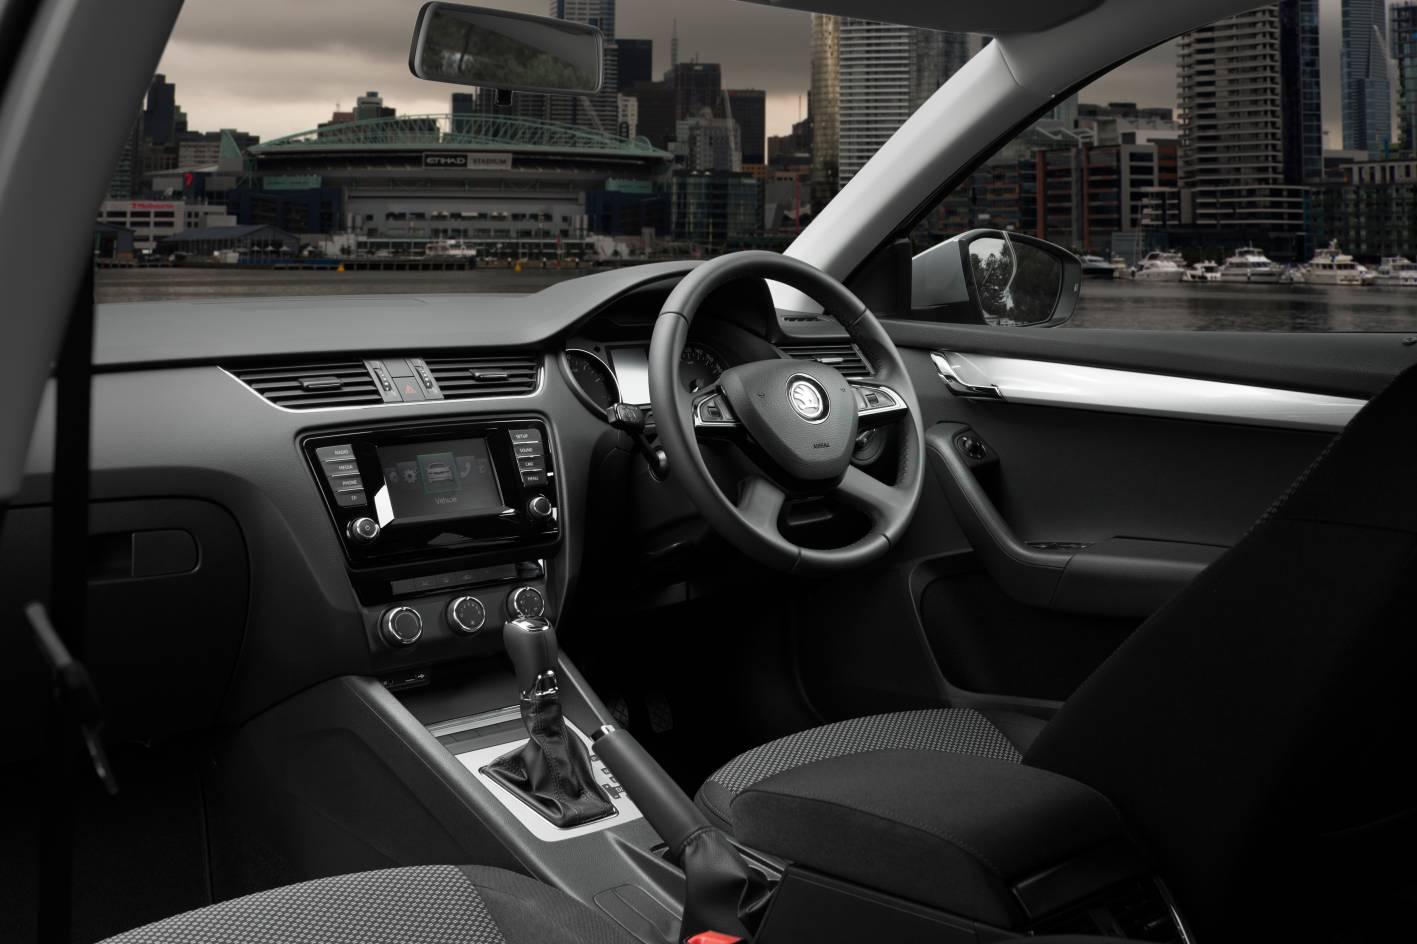 Skoda Octavia Ambition Plus interior dashboard - ForceGT.com